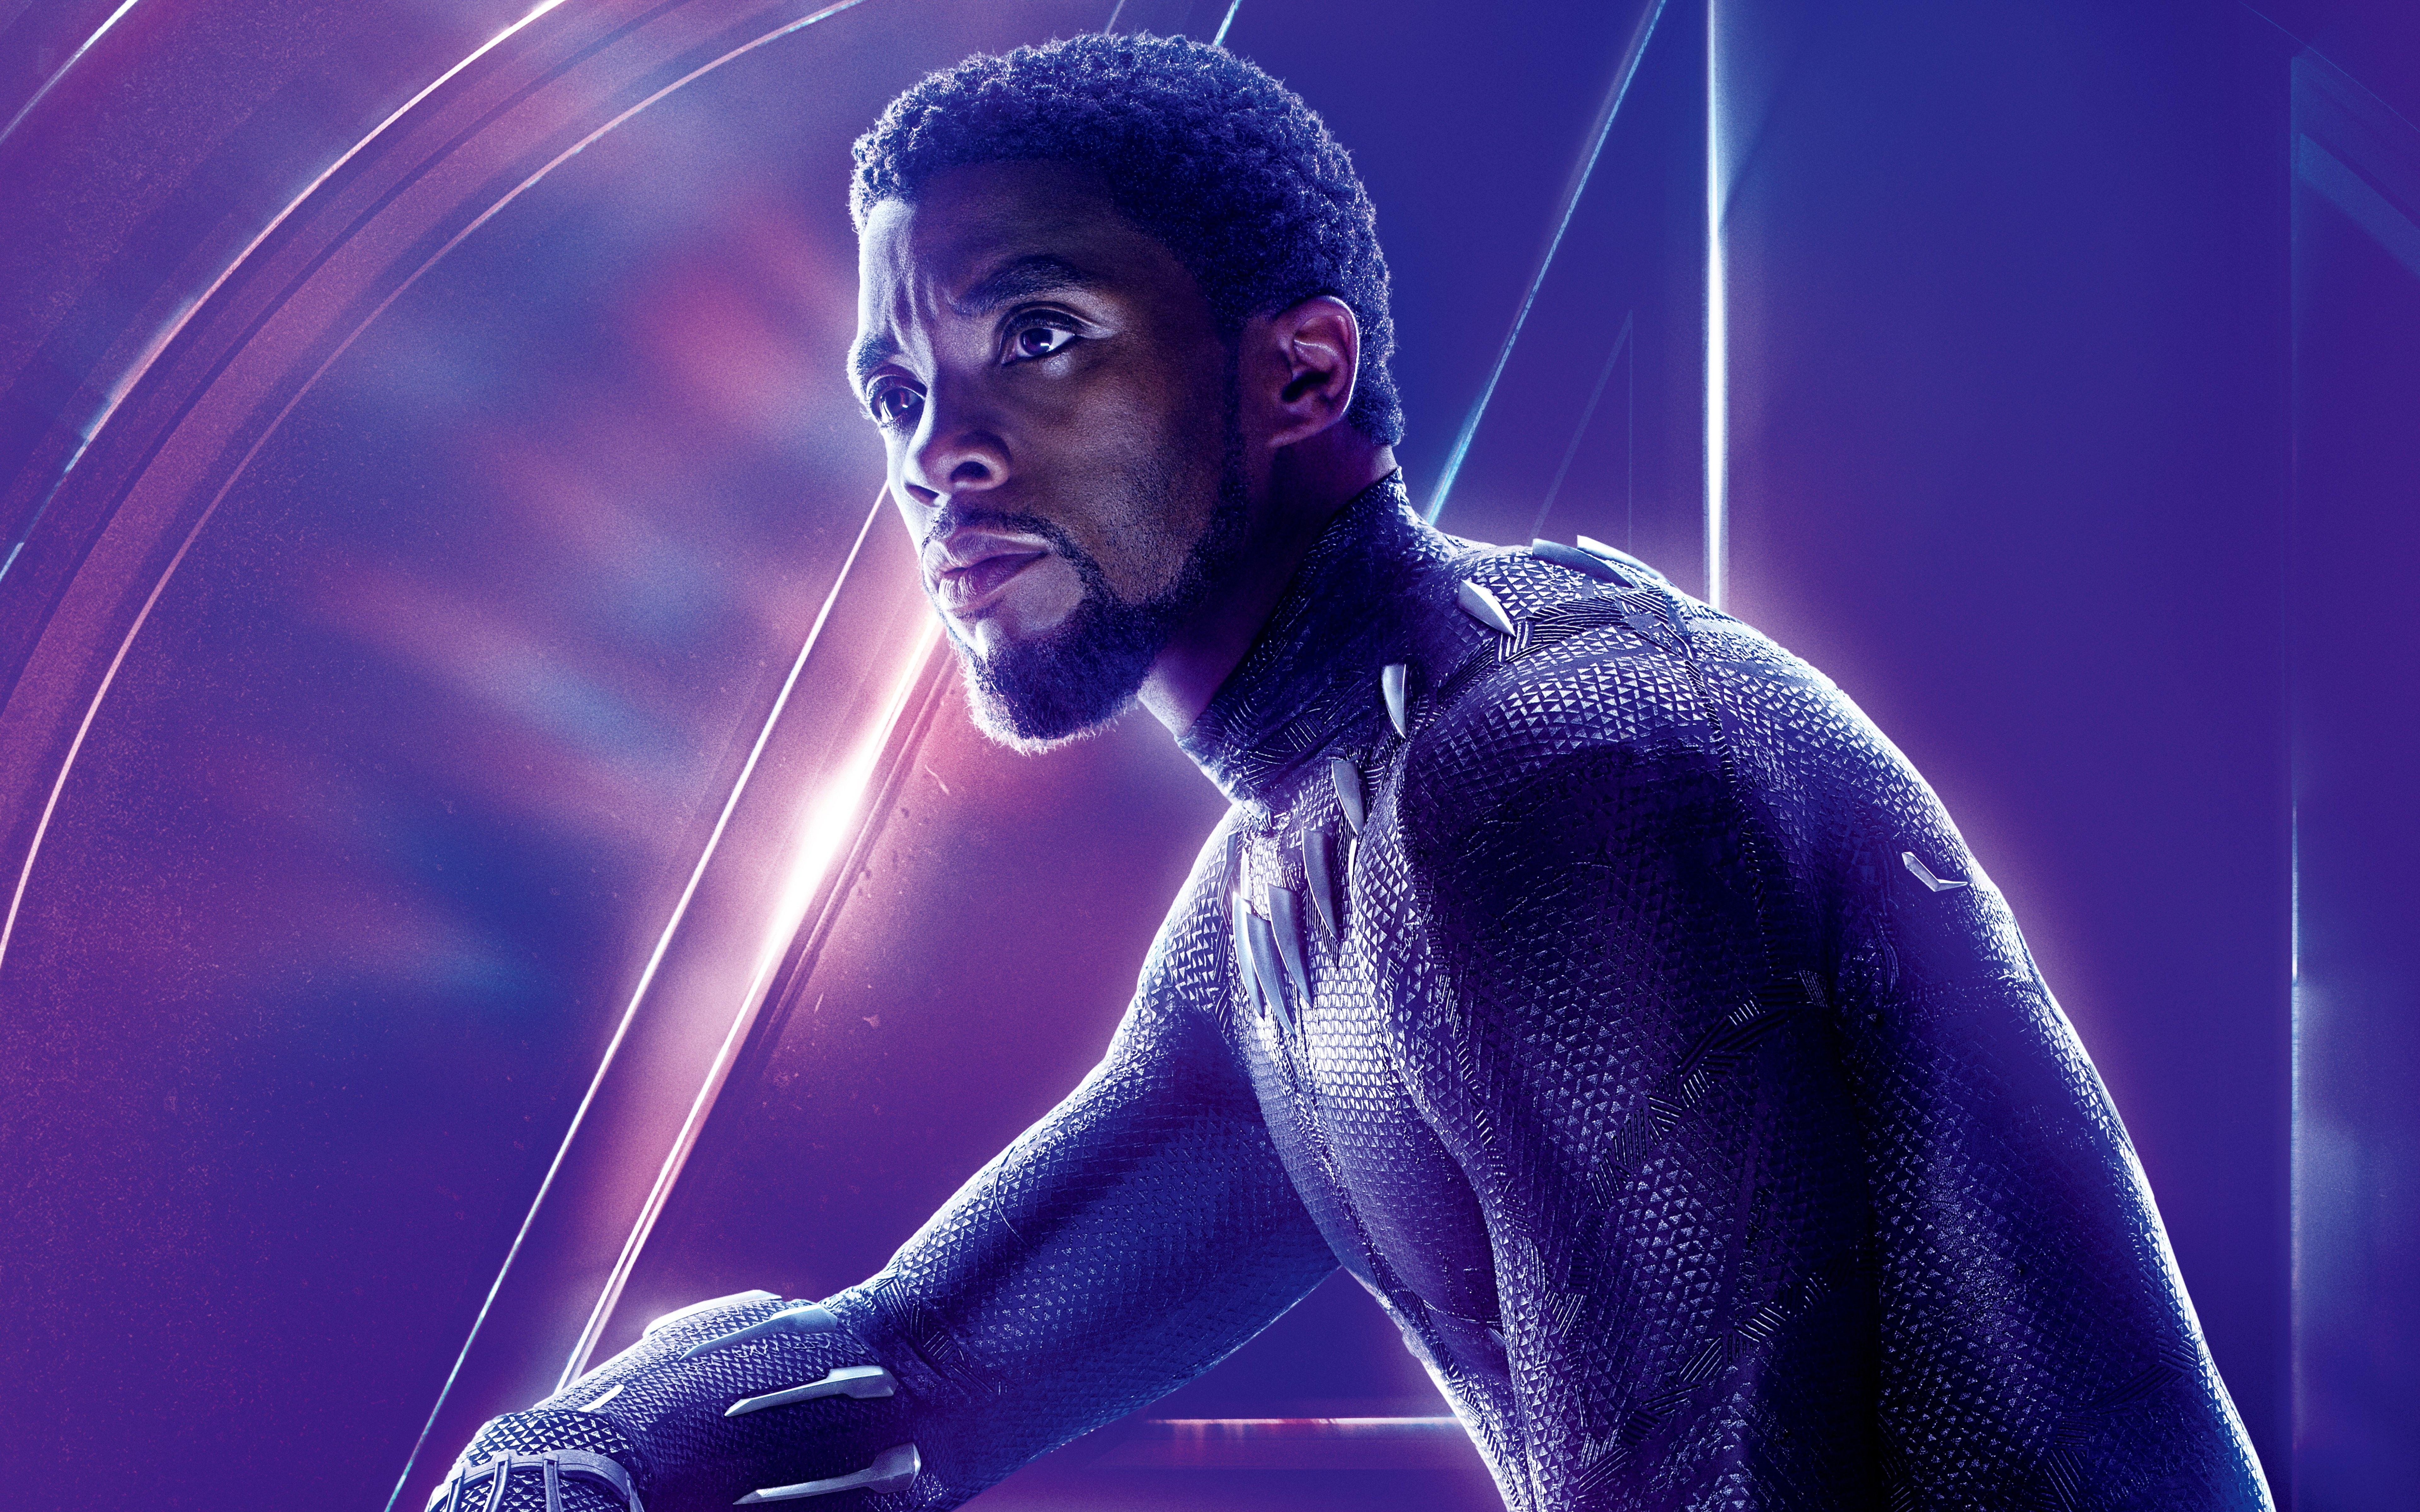 Avengers Infinity War 2018 Thanos 4k Uhd 3 2 3840x2560: Avengers: Infinity War (2018) Black Panther 8K Ultra HD